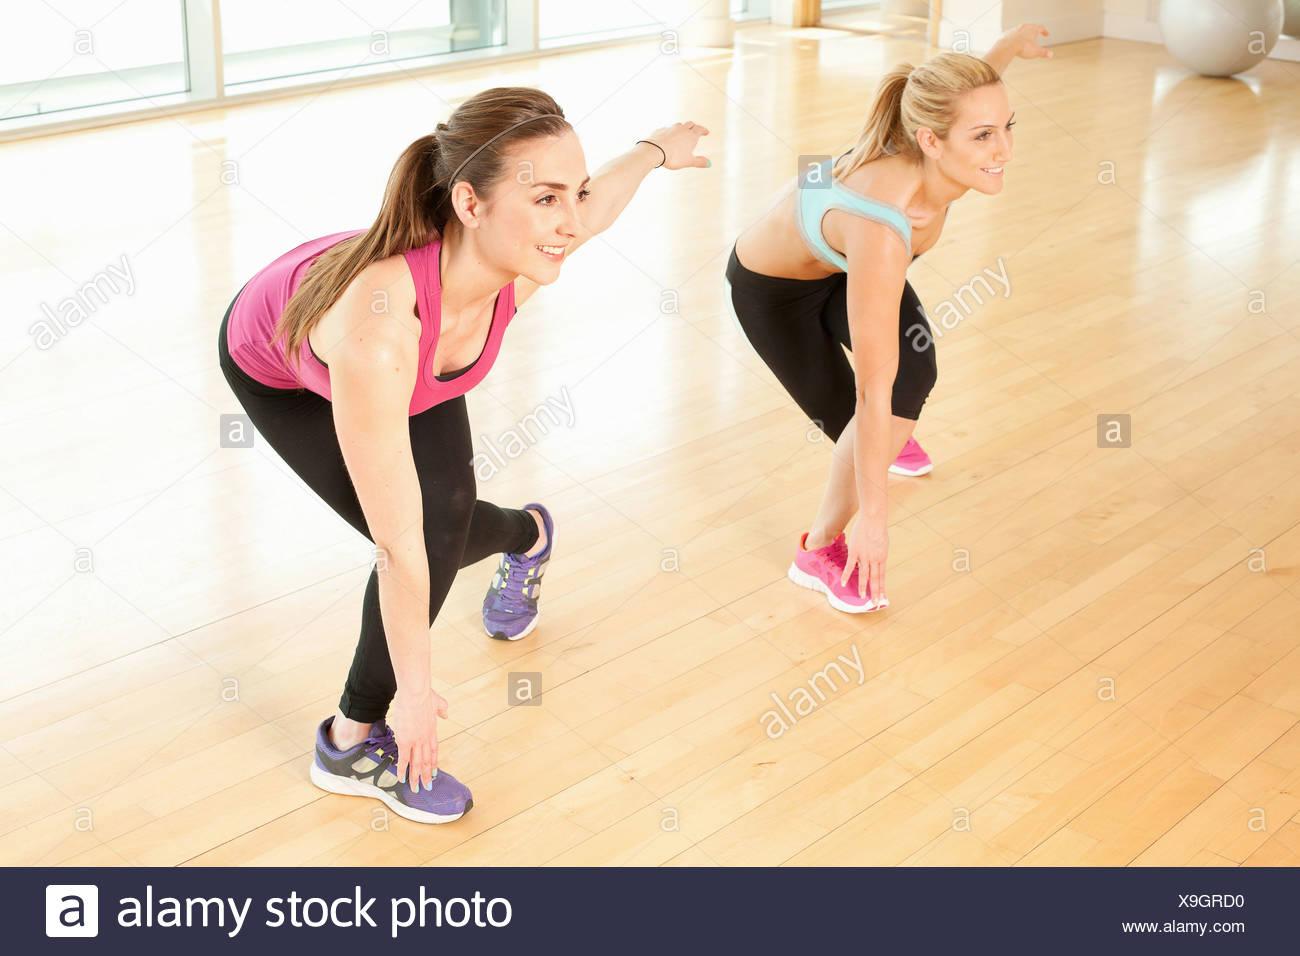 Women doing fitness class - Stock Image